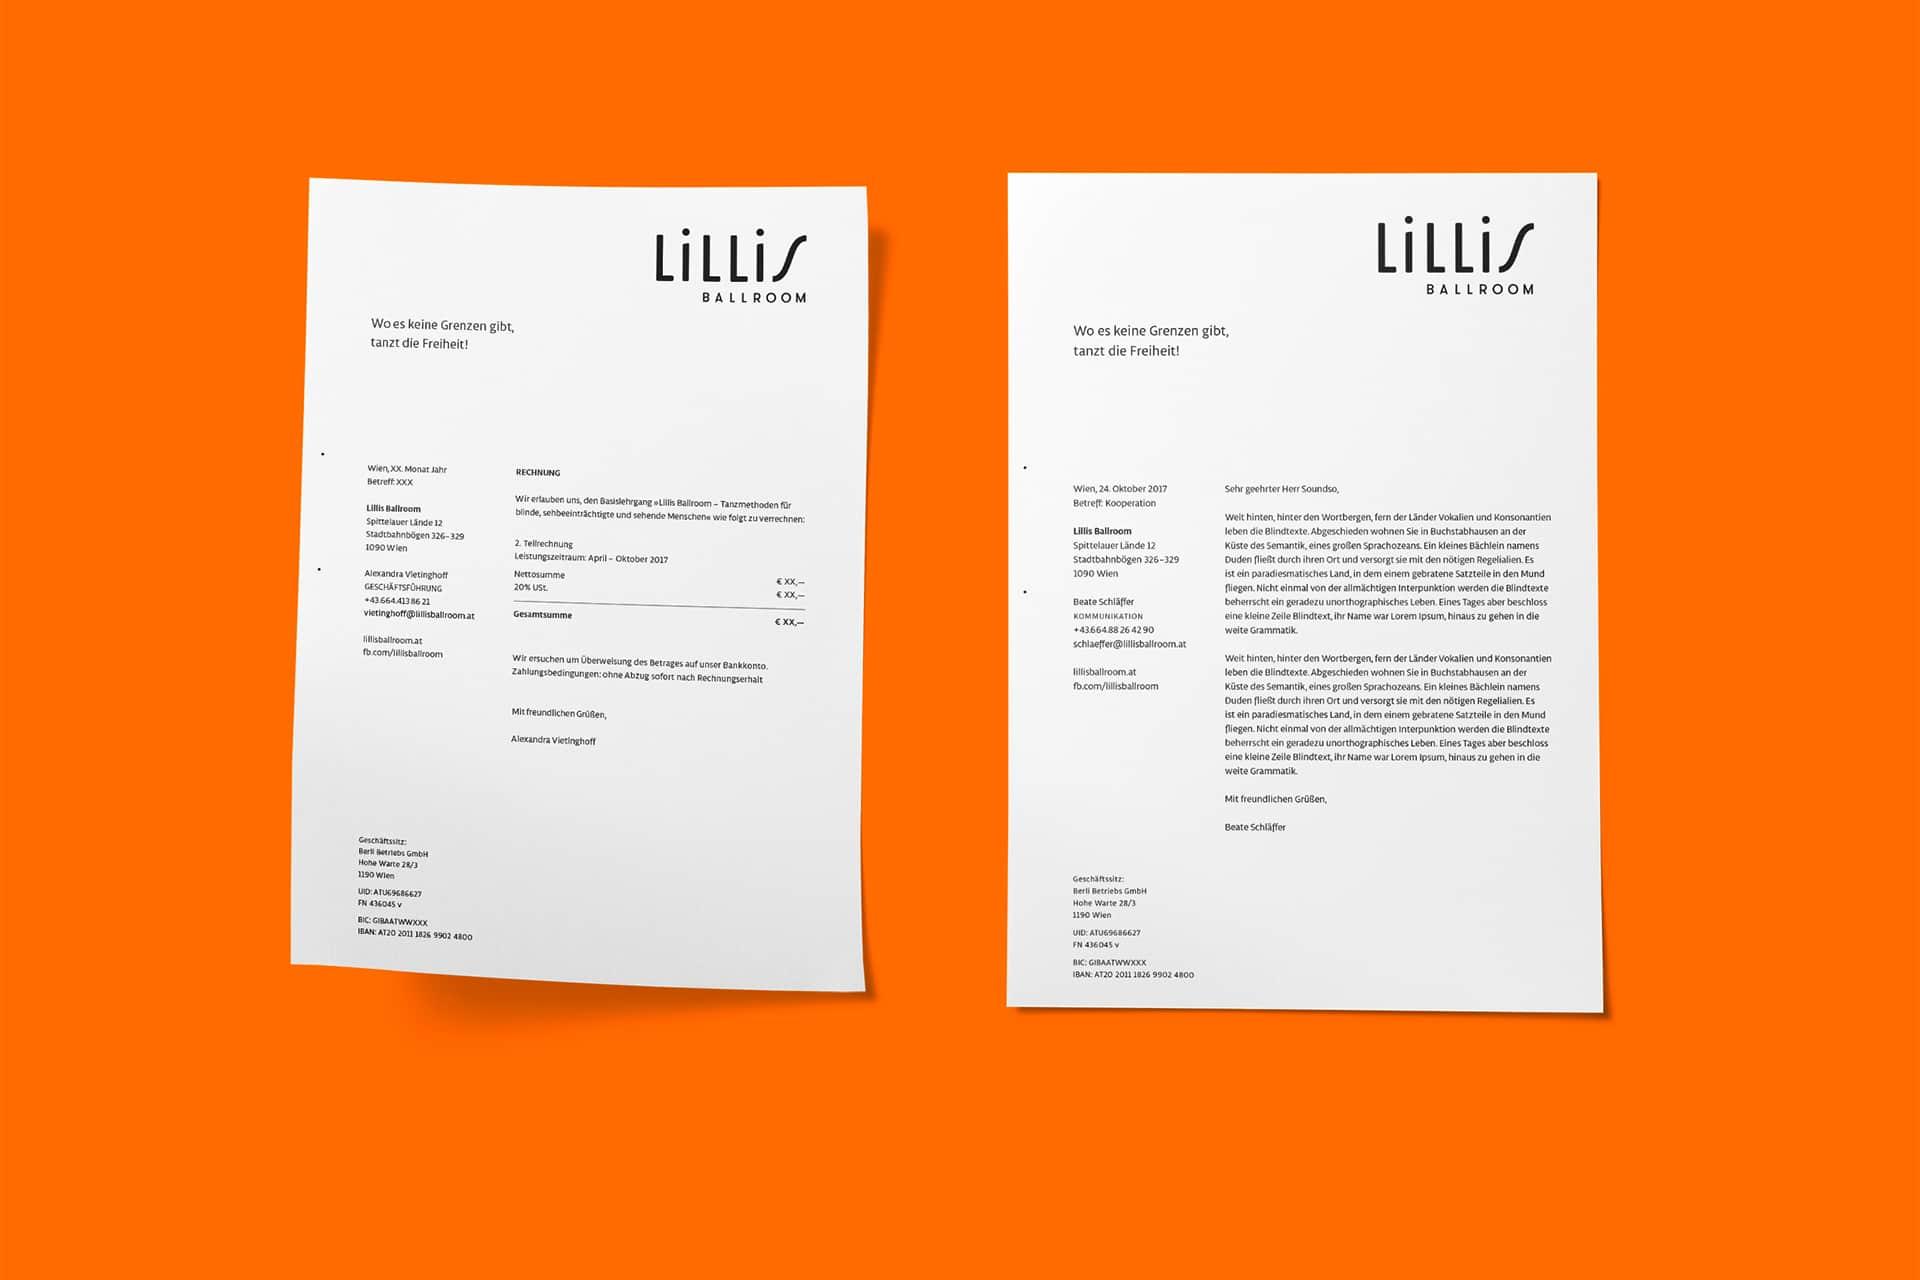 Lillis Ballroom Briefpapier